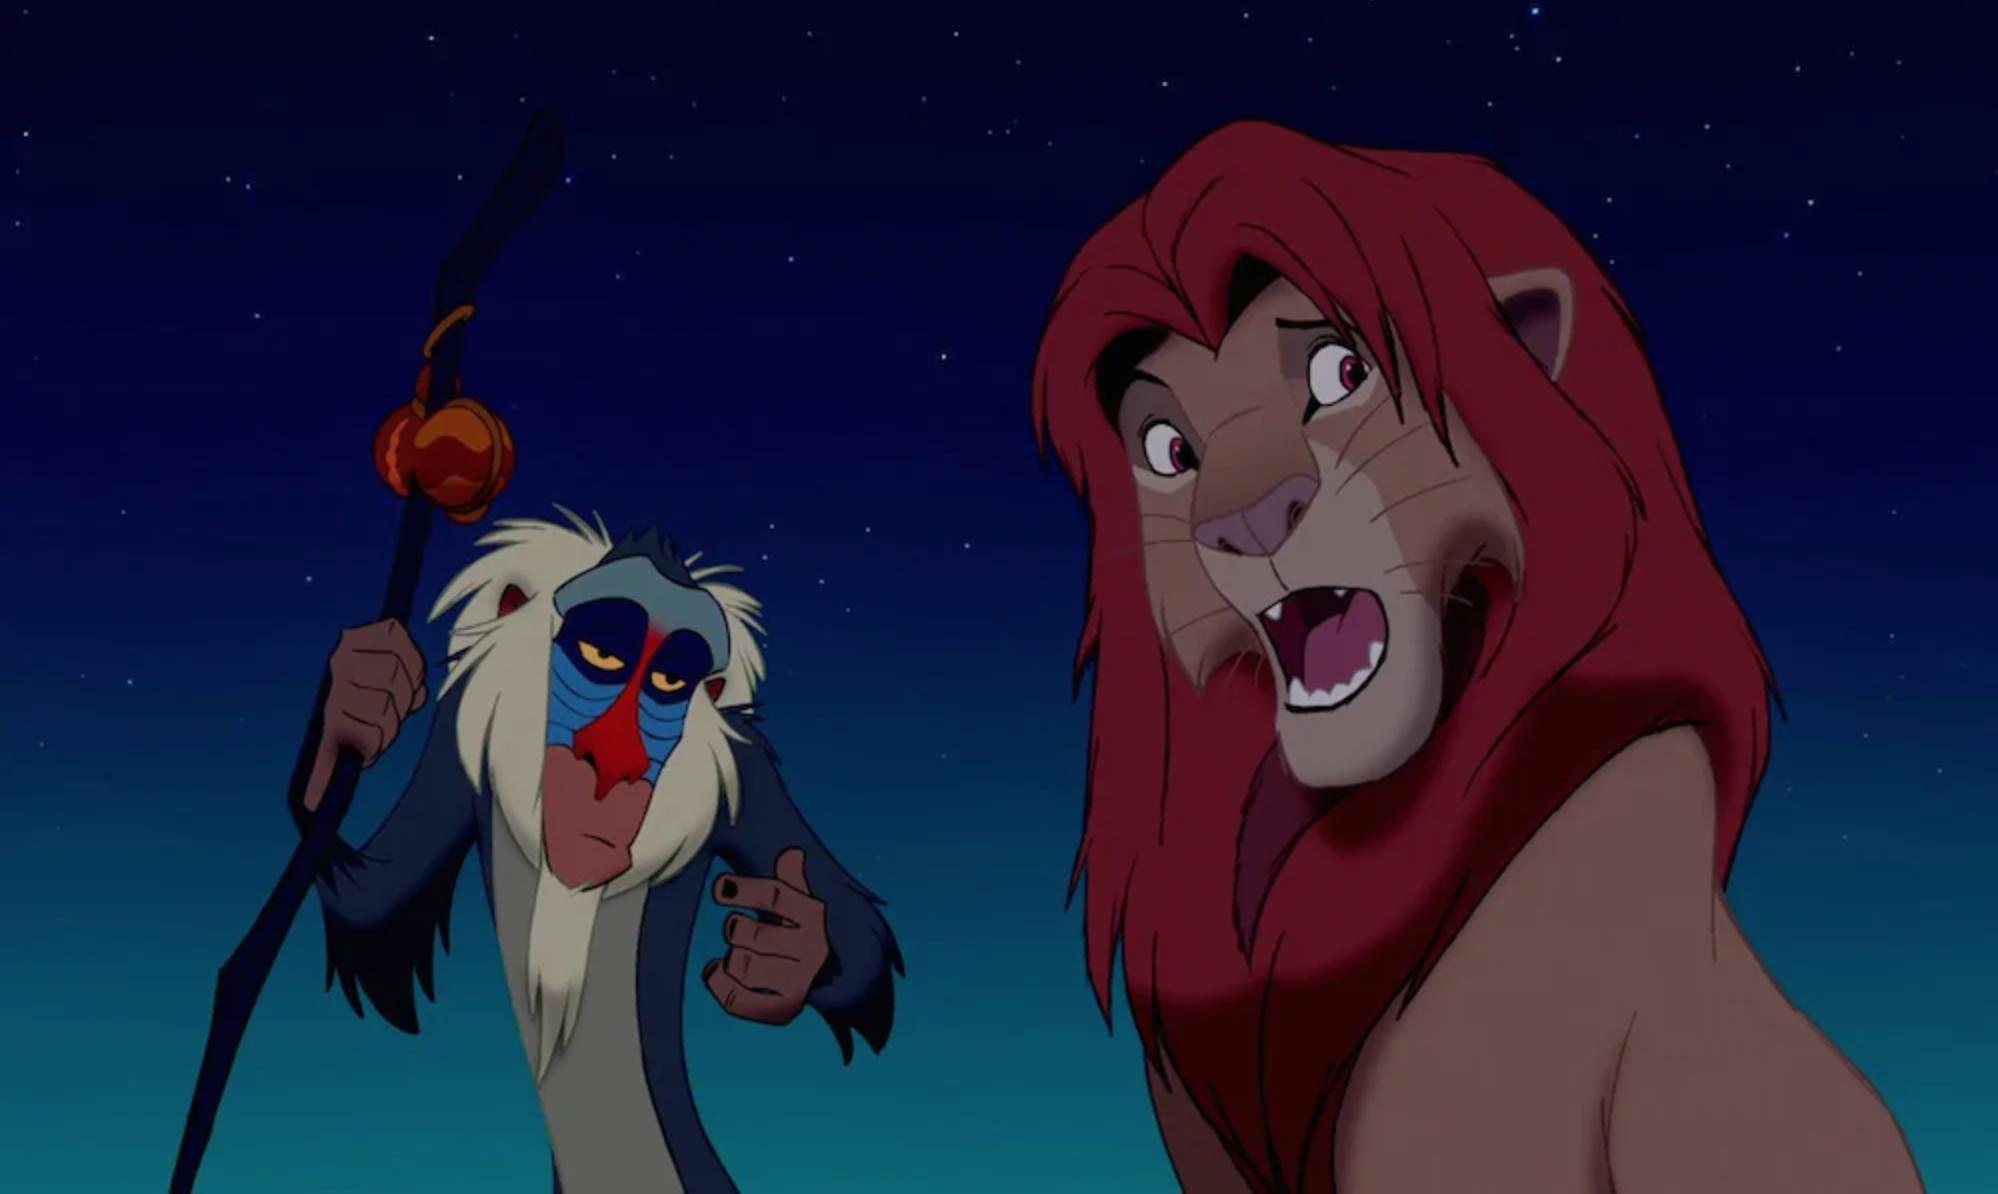 Change is good. —Rafiki, The Lion King | Image by  Disney